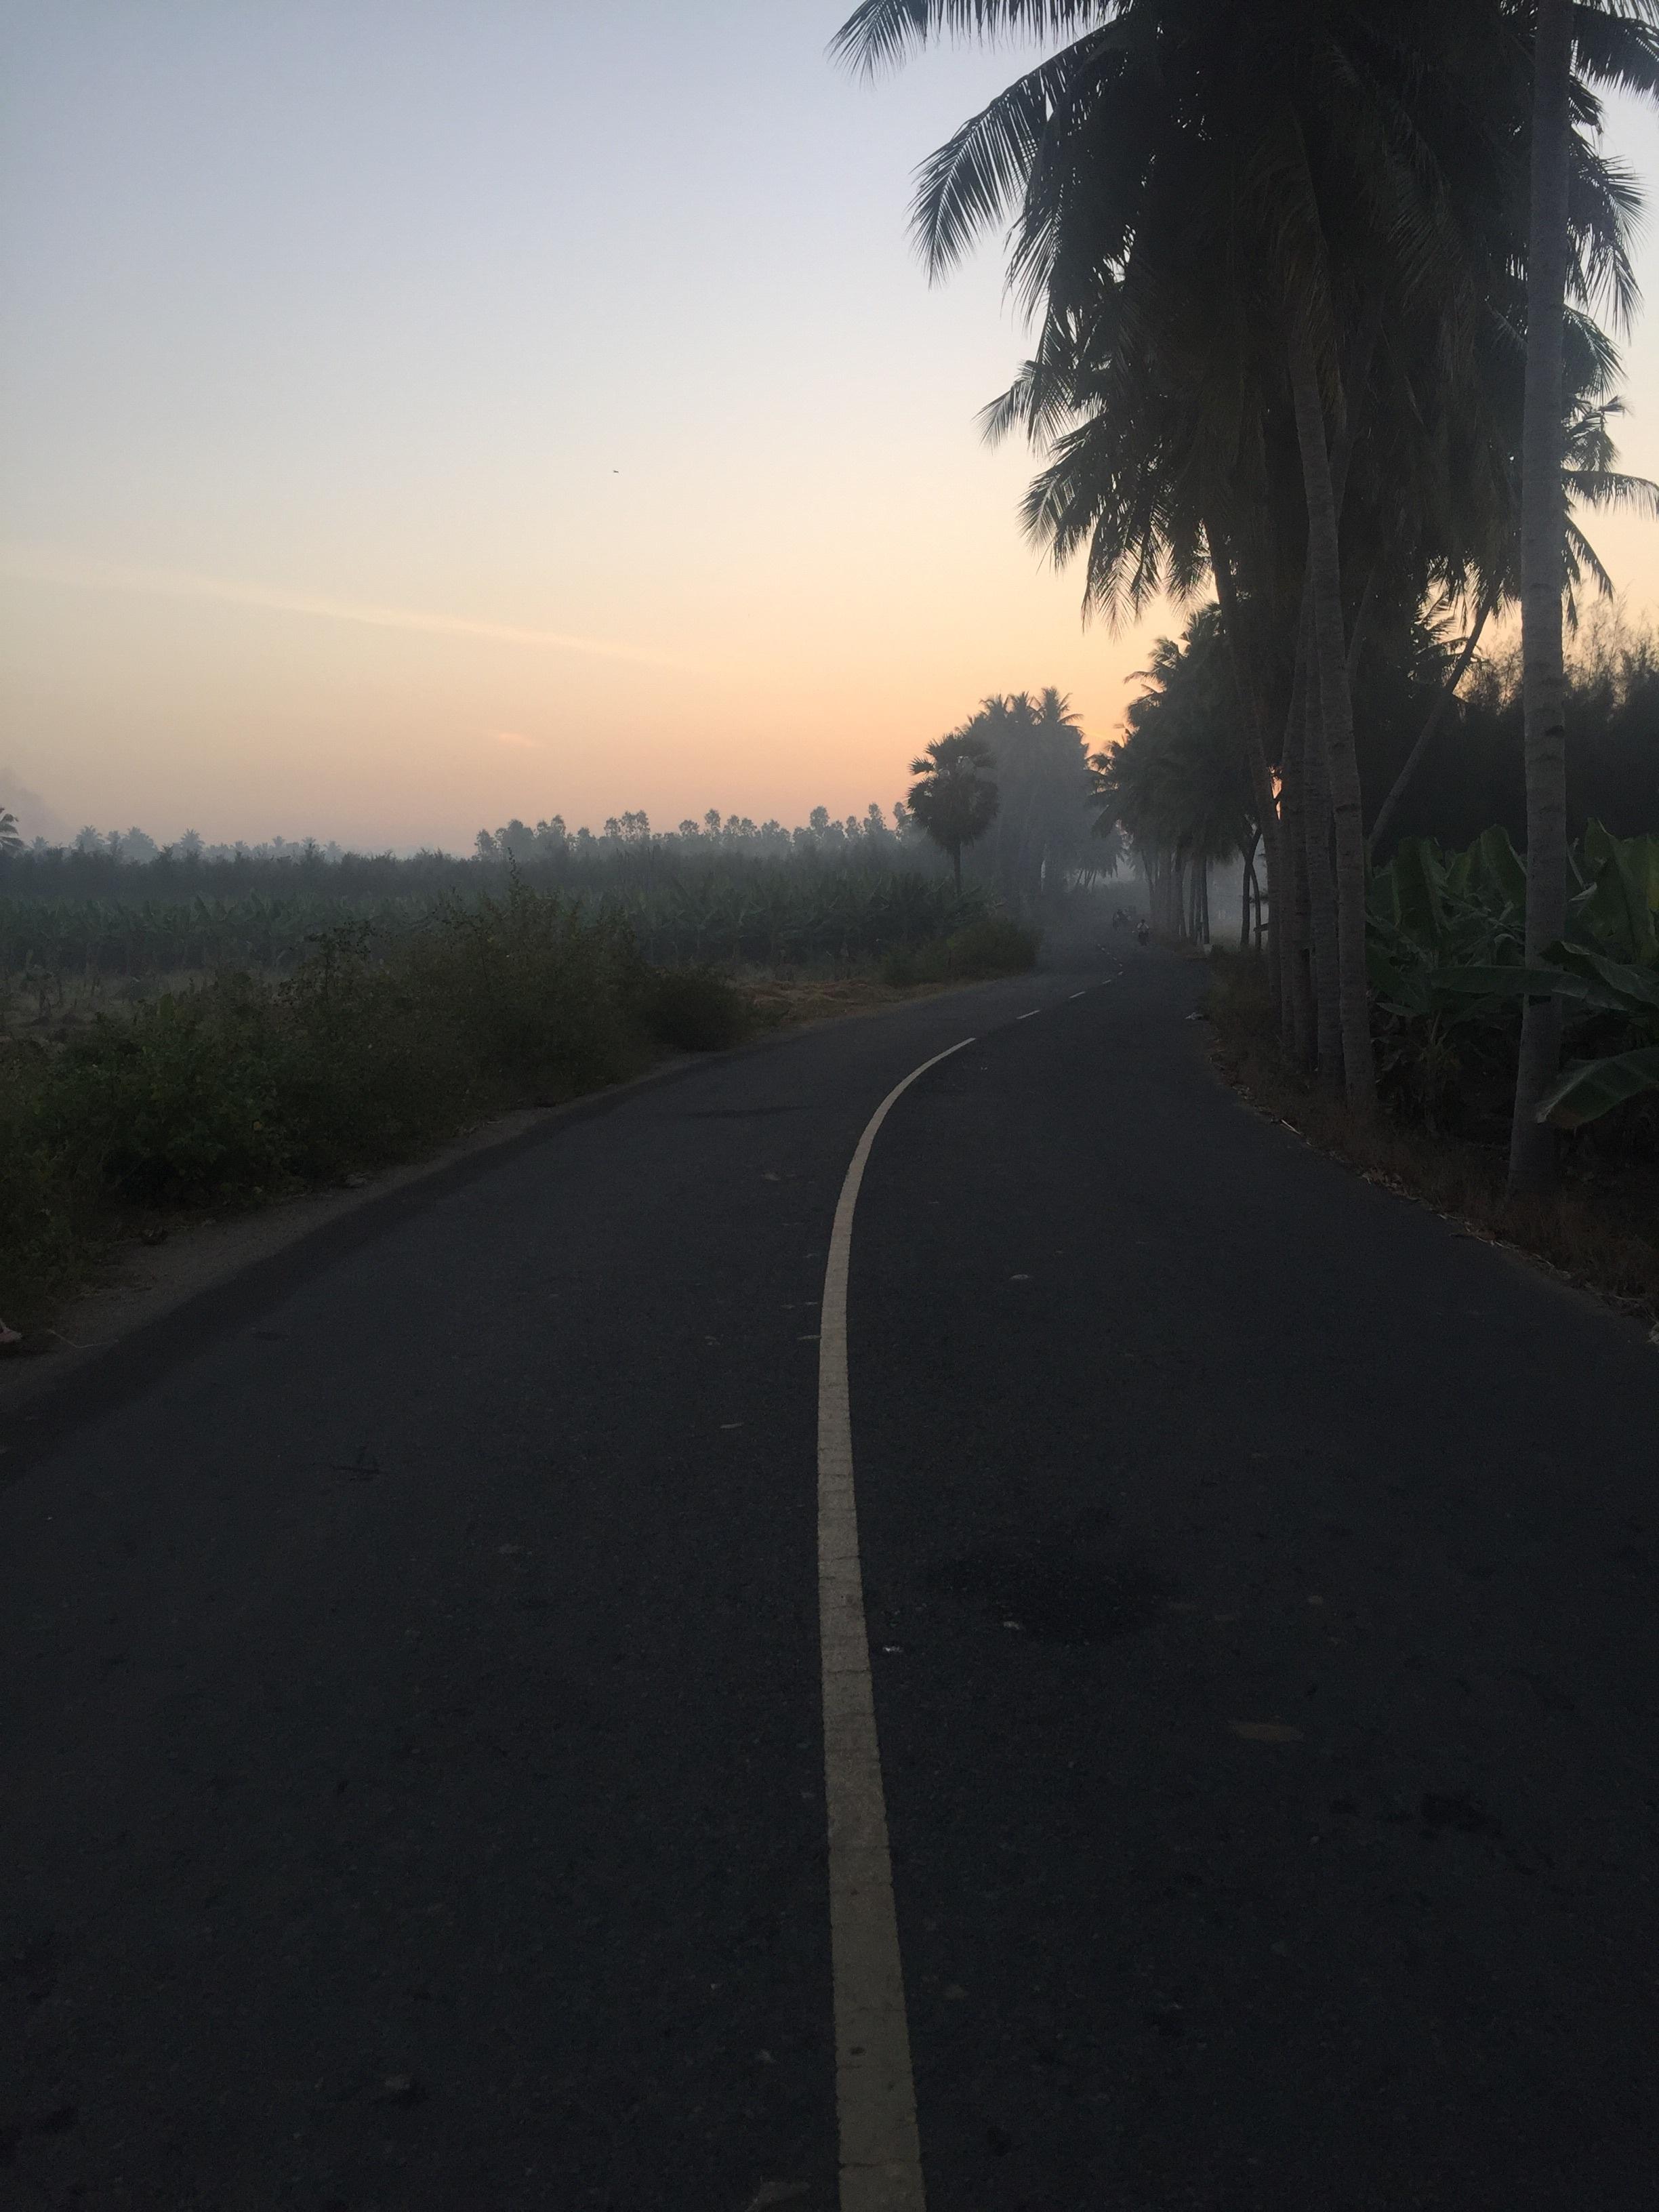 Strolling through the morning mist